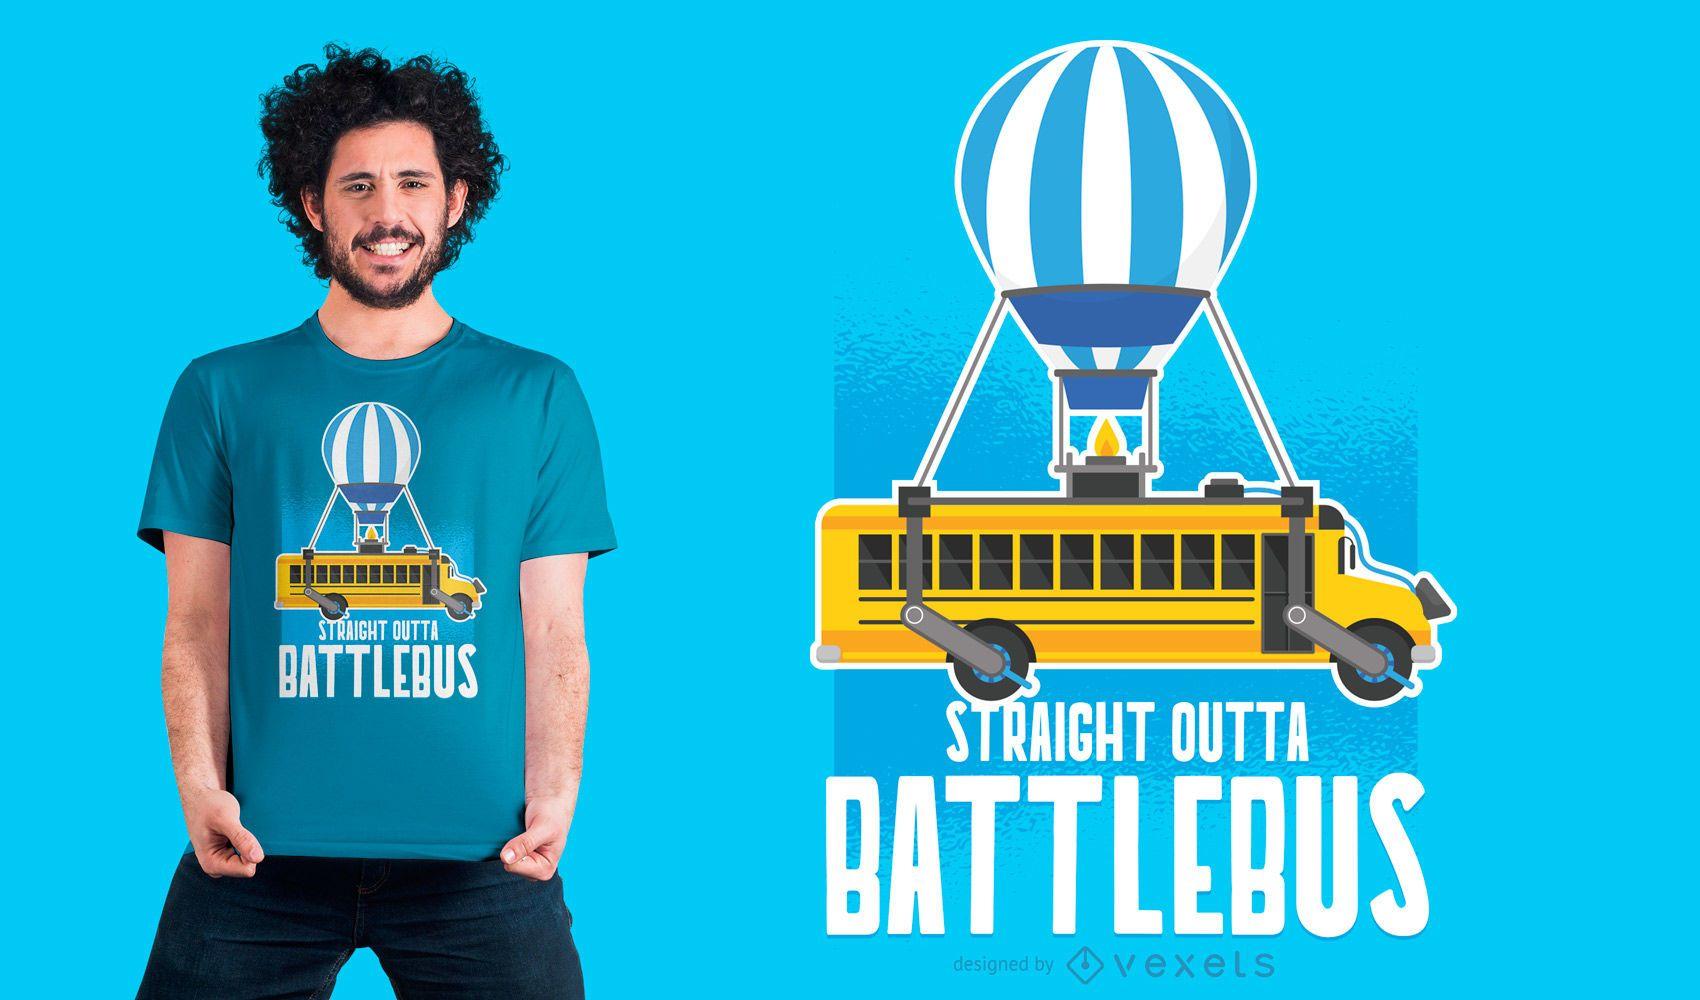 Straight Outta Battlebus Parody T-shirt Design